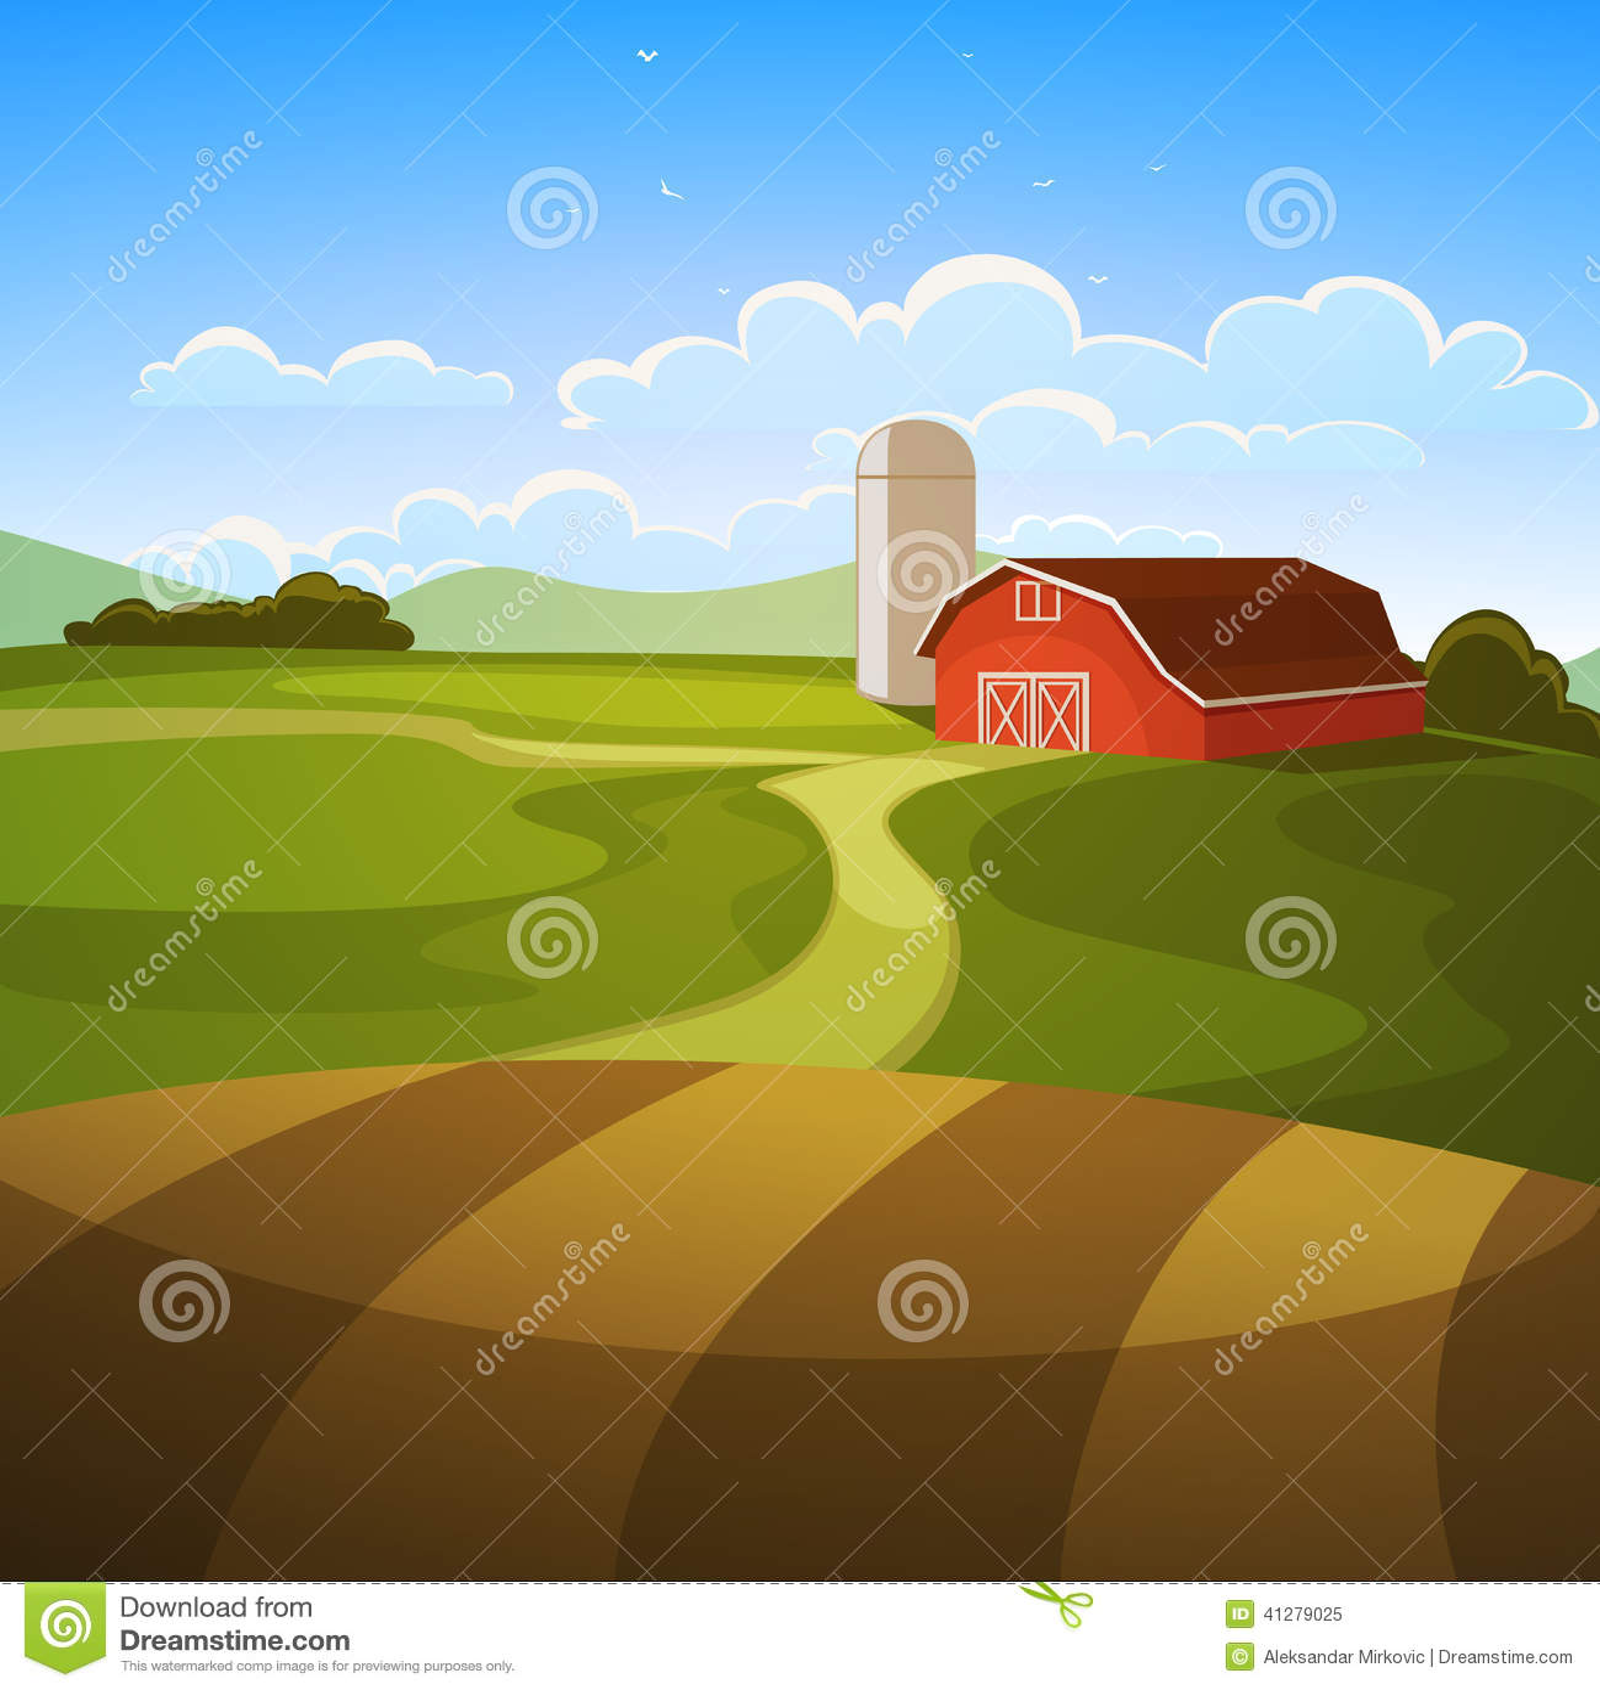 Landscape Illustration Vector Free: Farm Landscape Stock Vector